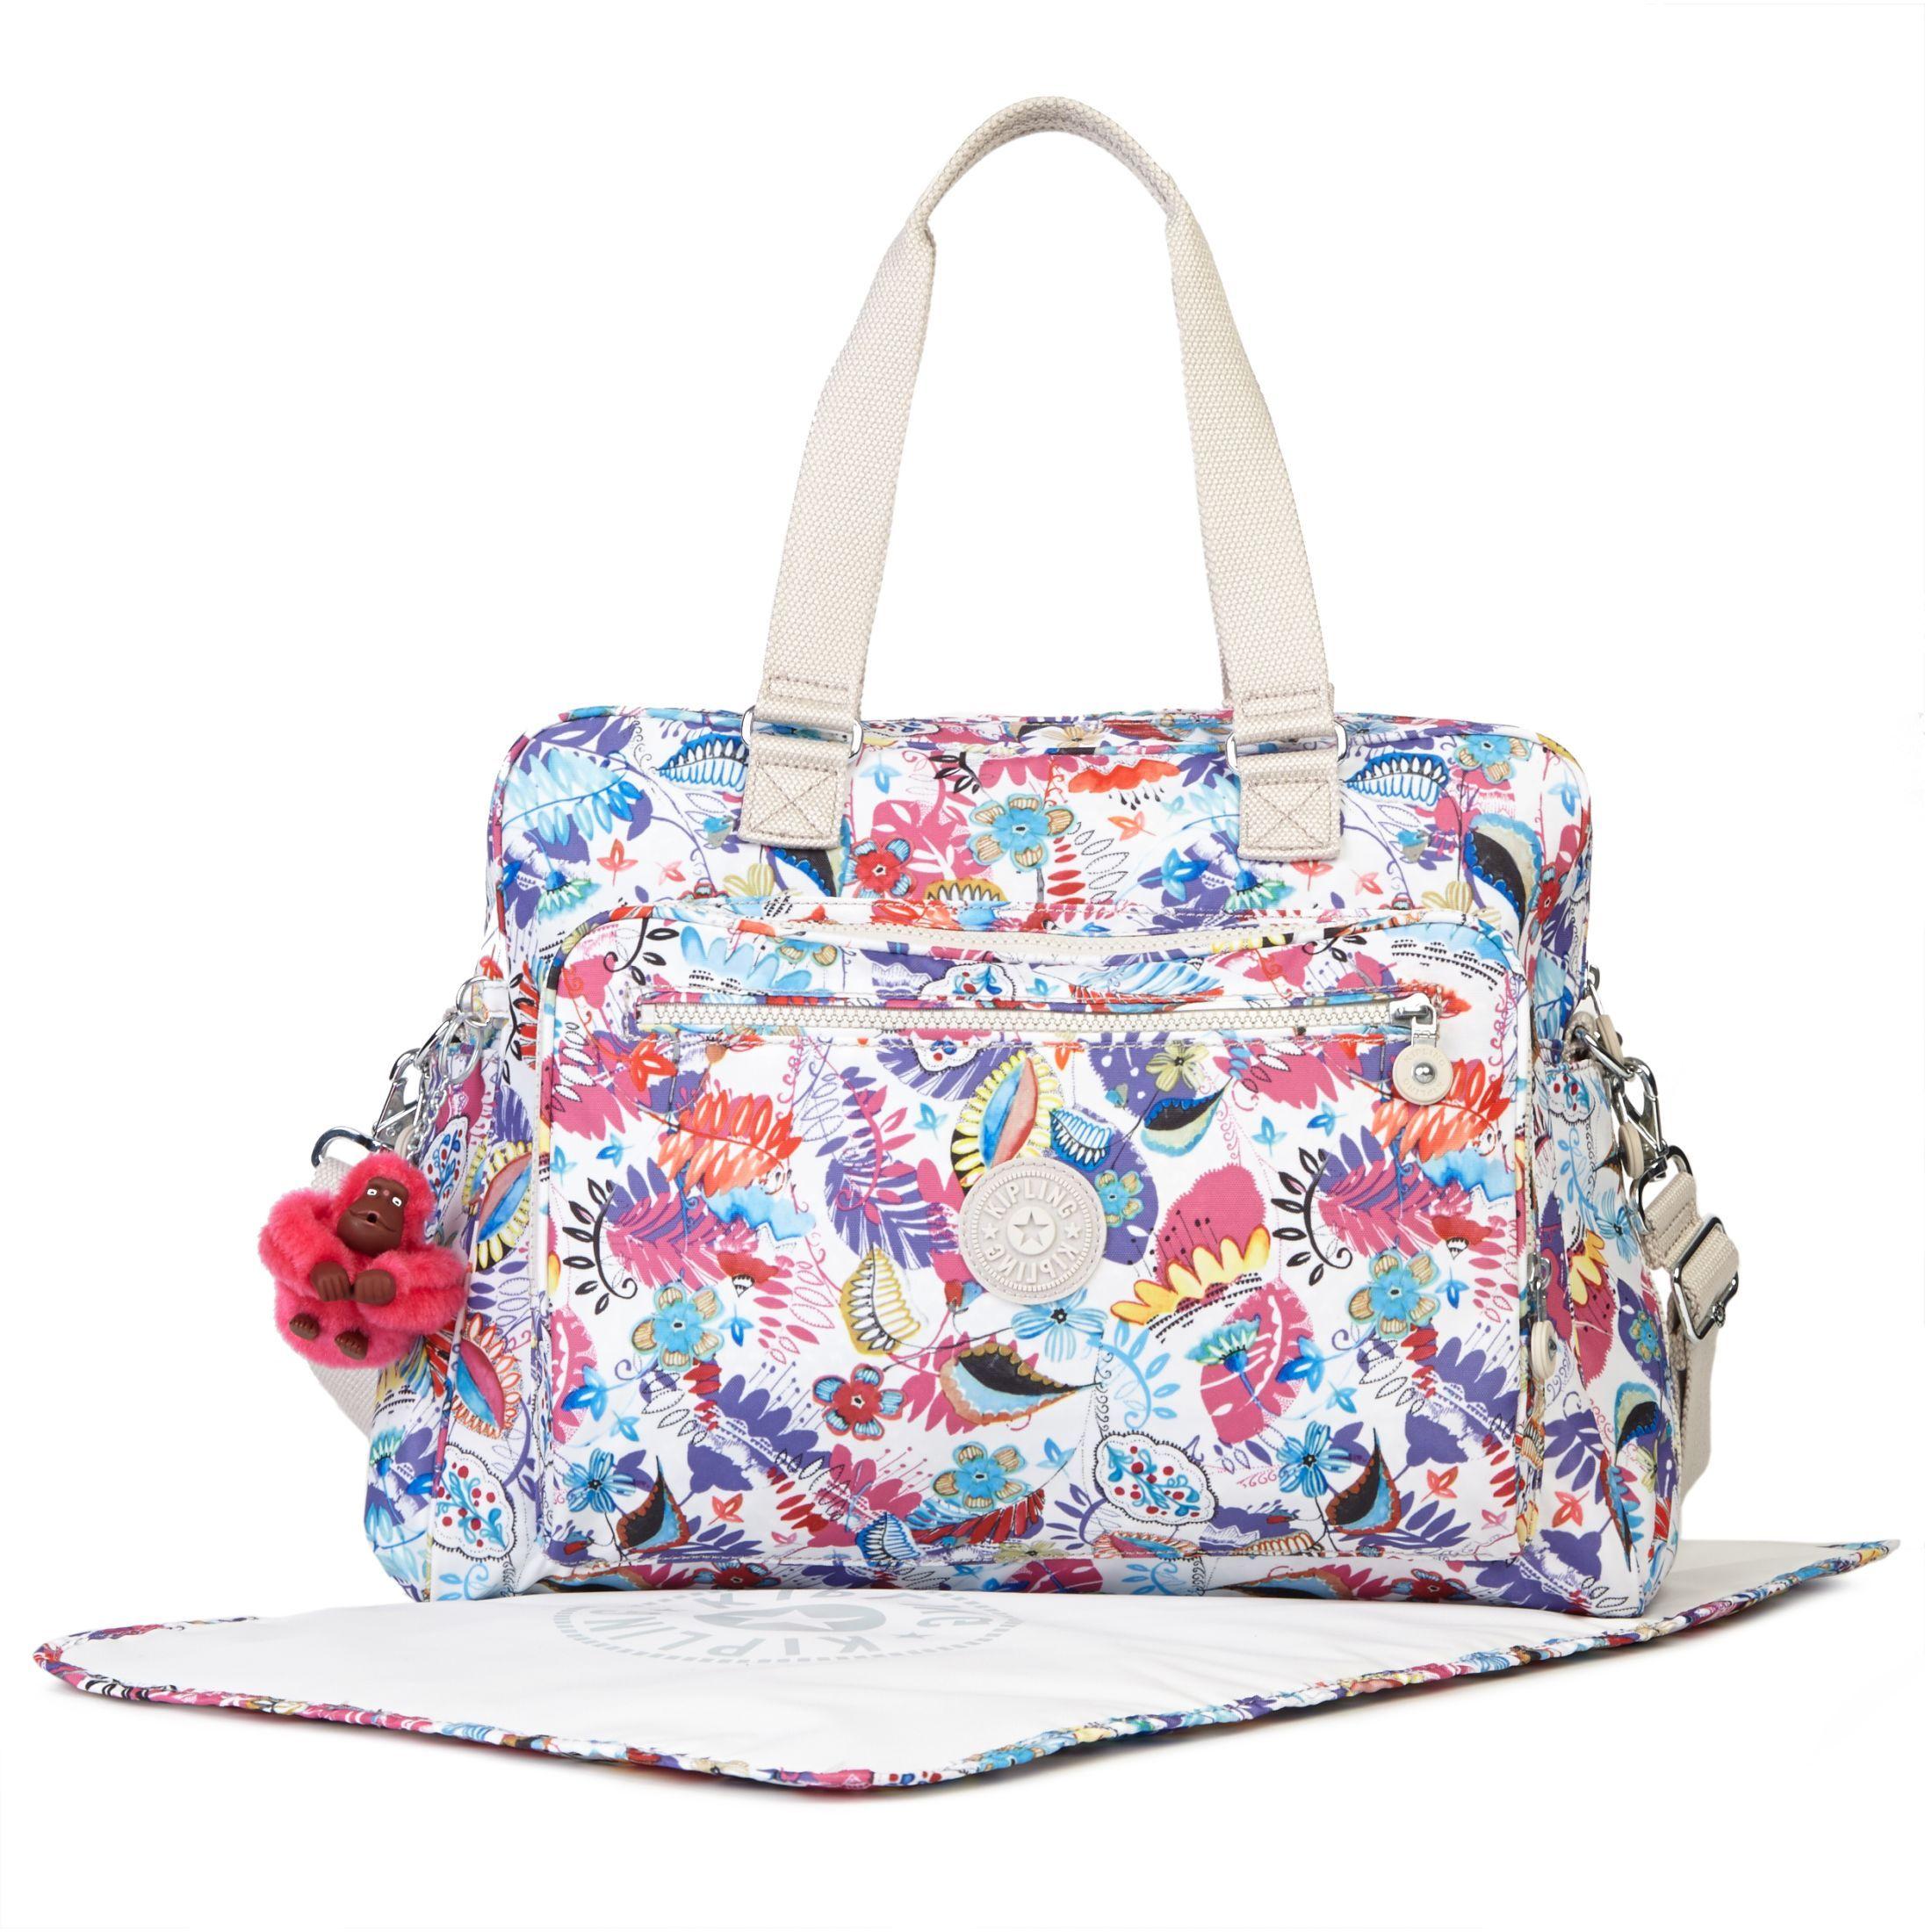 Alanna Printed Baby Bag - Whimsy Floral | Kipling